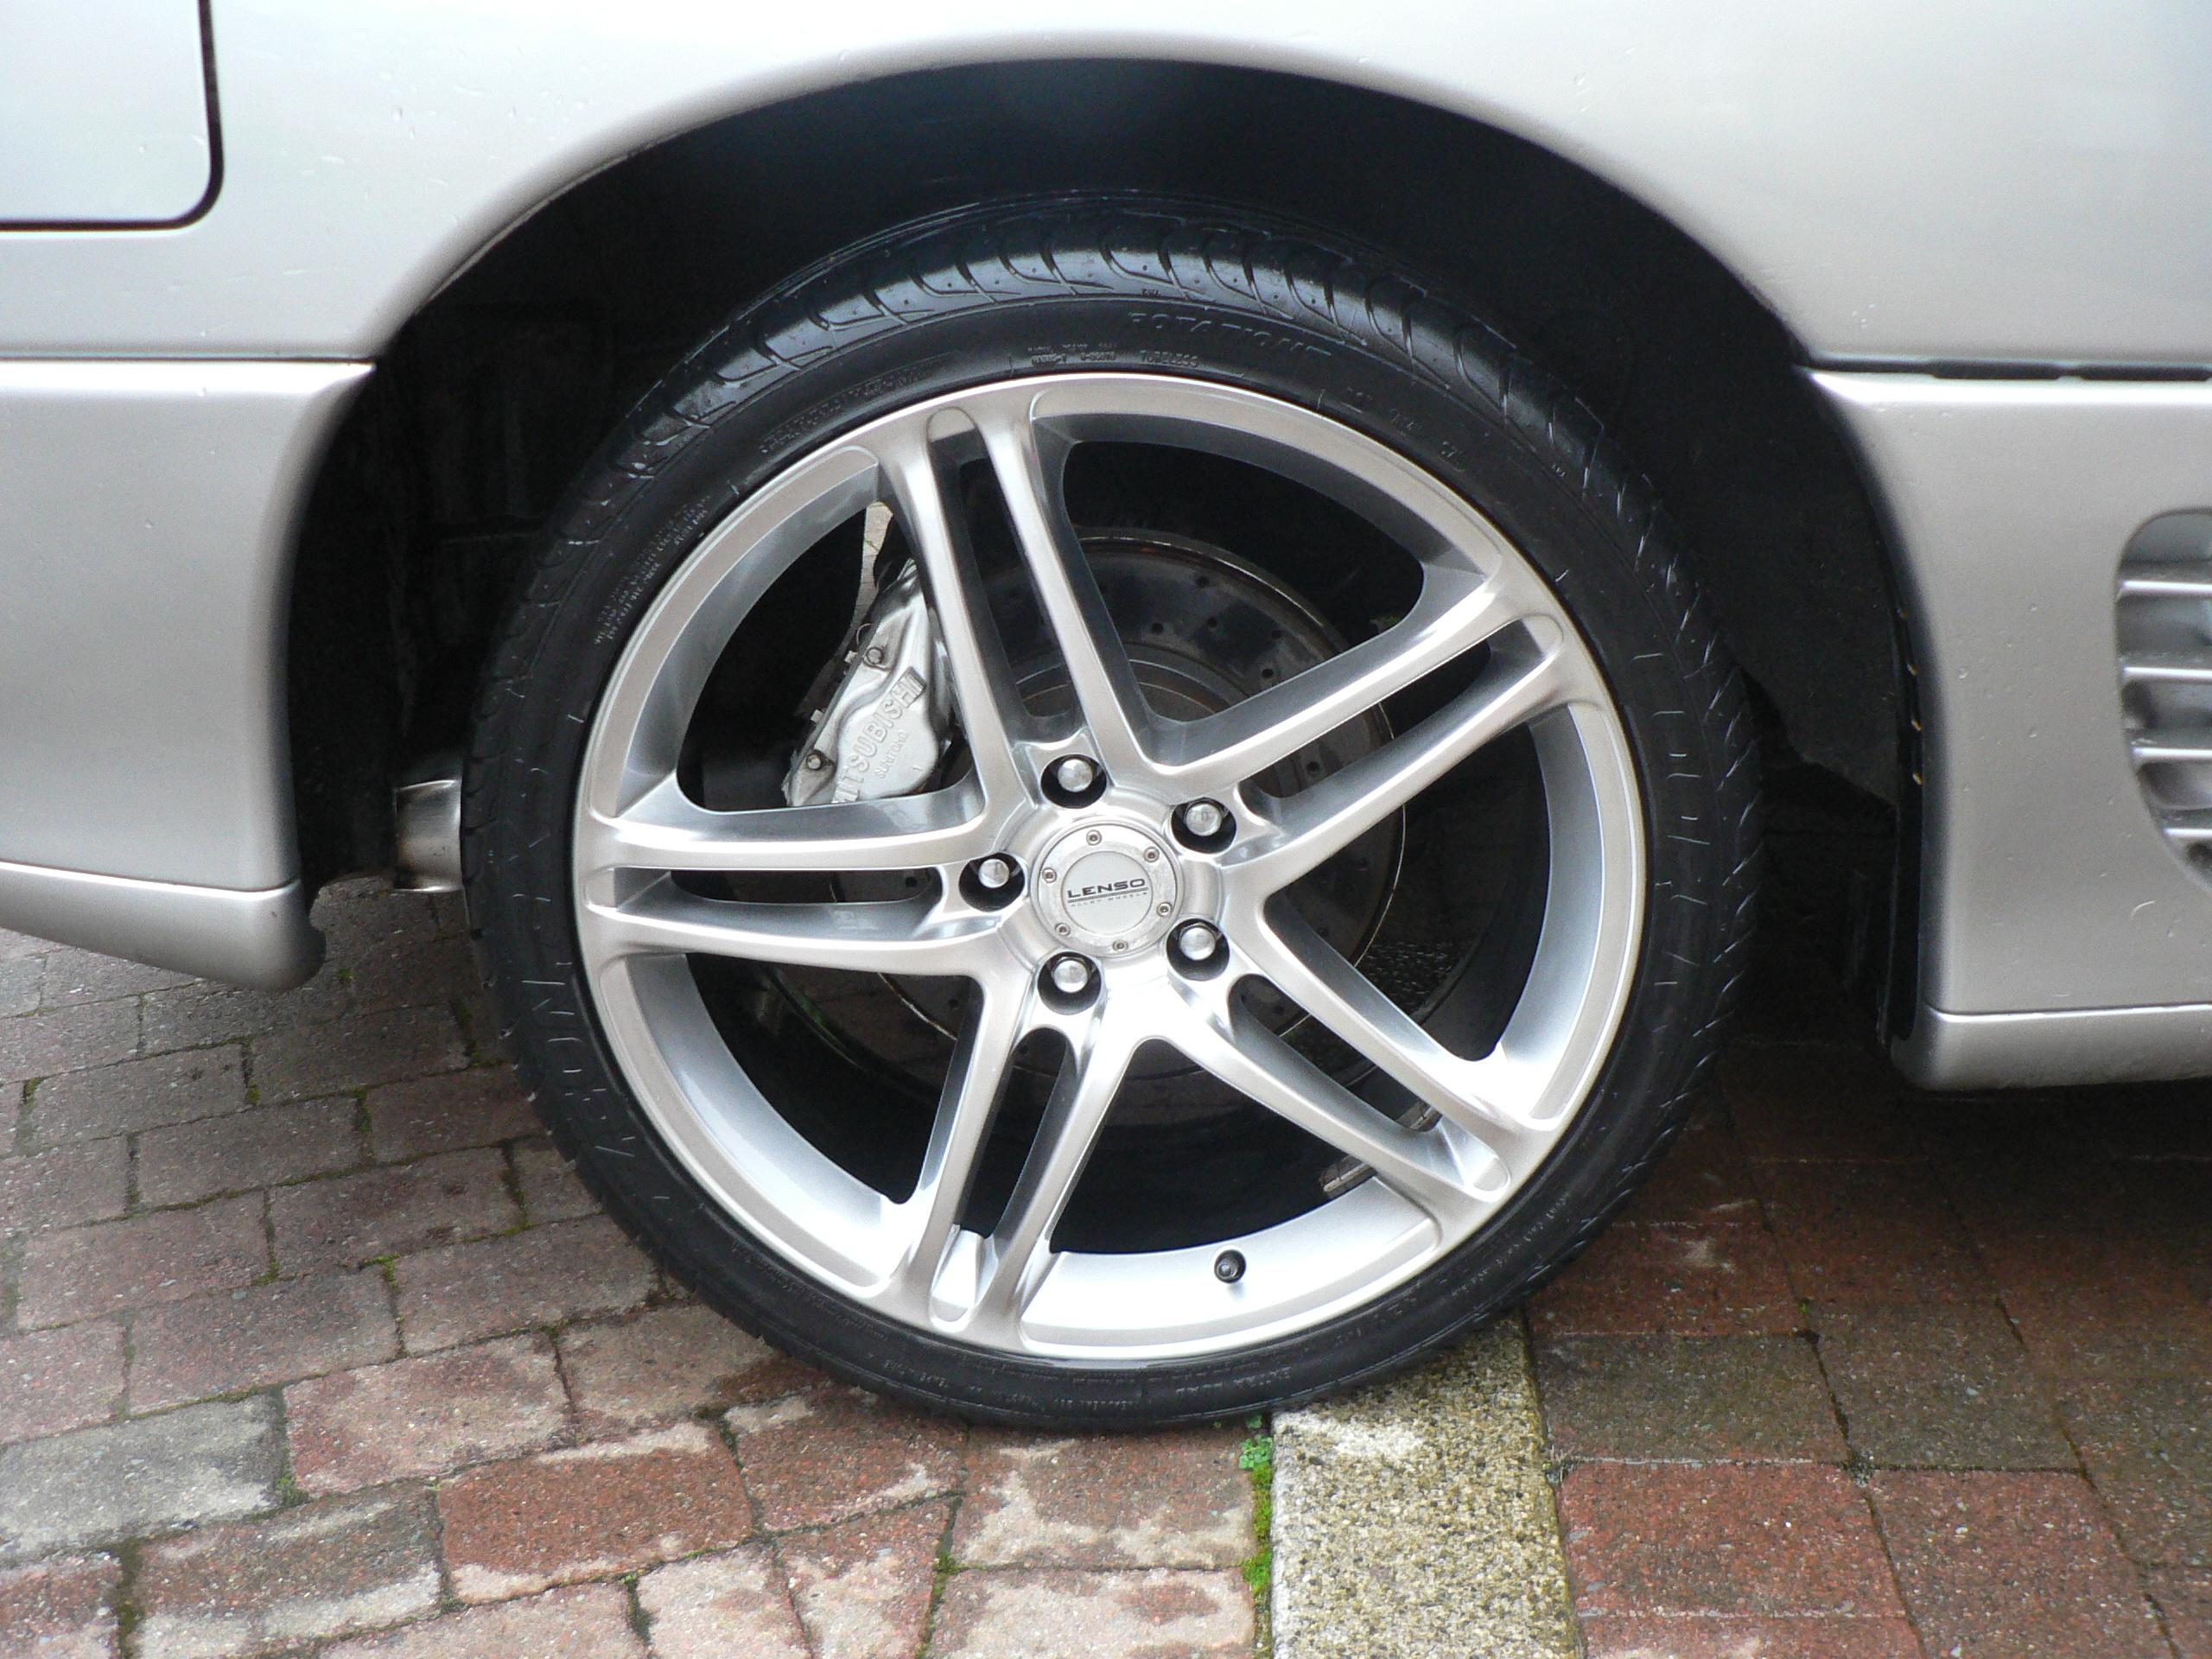 alloy wheels for my 1993 jdm na mitsubishi gto - newbie - gto uk